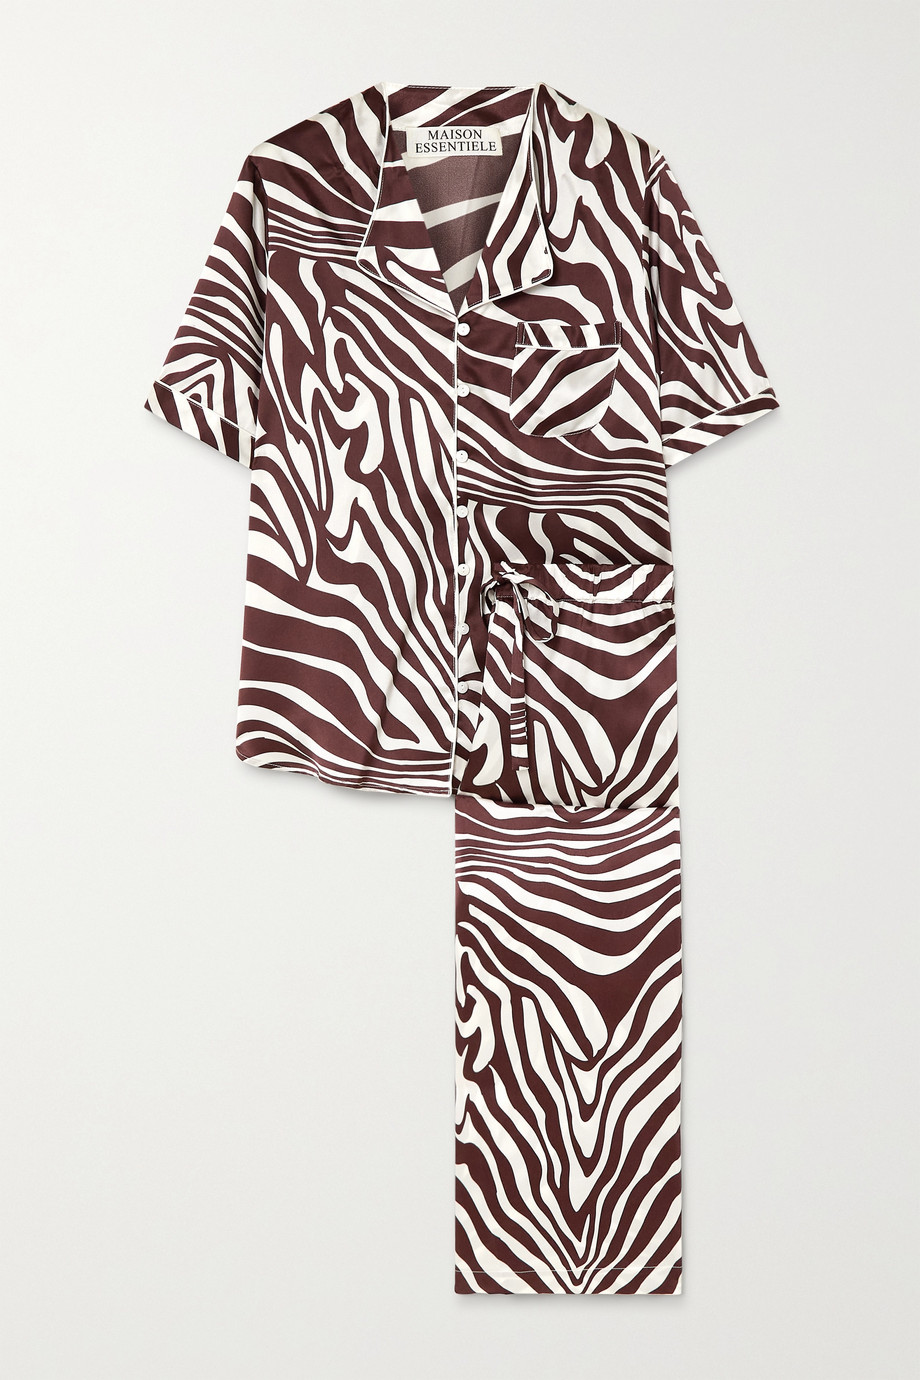 Maison Essentiele Emma Pyjama aus Seidensatin mit Zebraprint